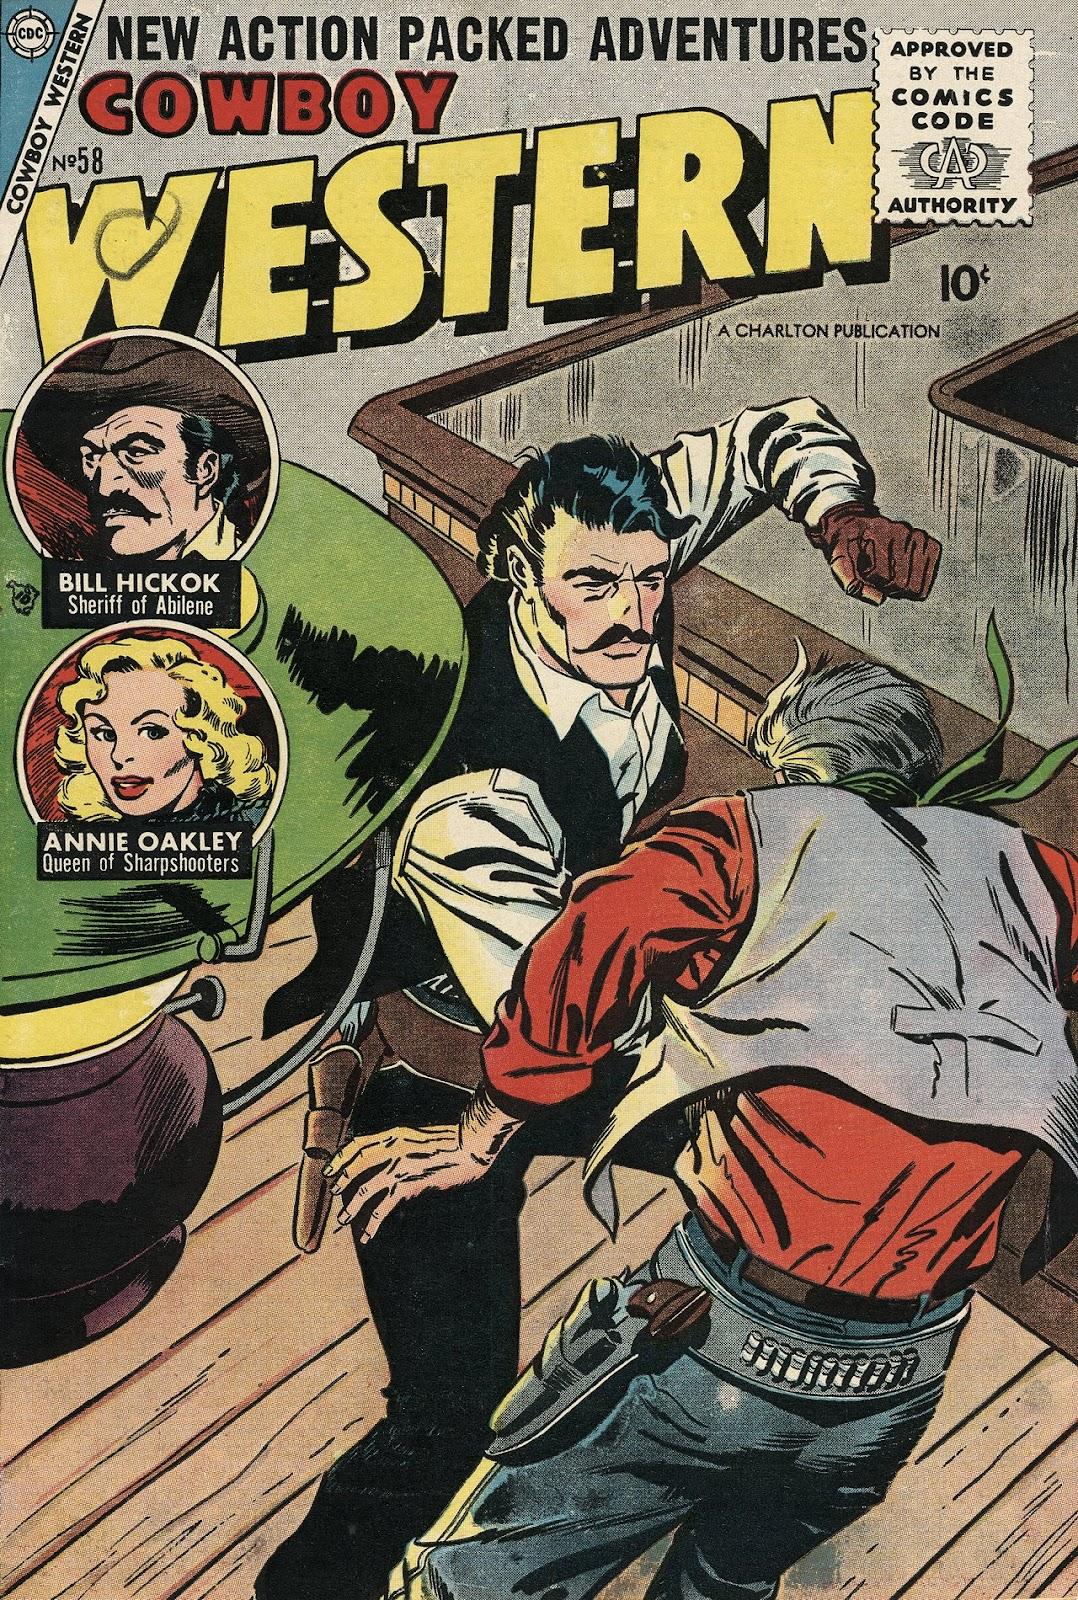 Cowboy Western 58 Page 1